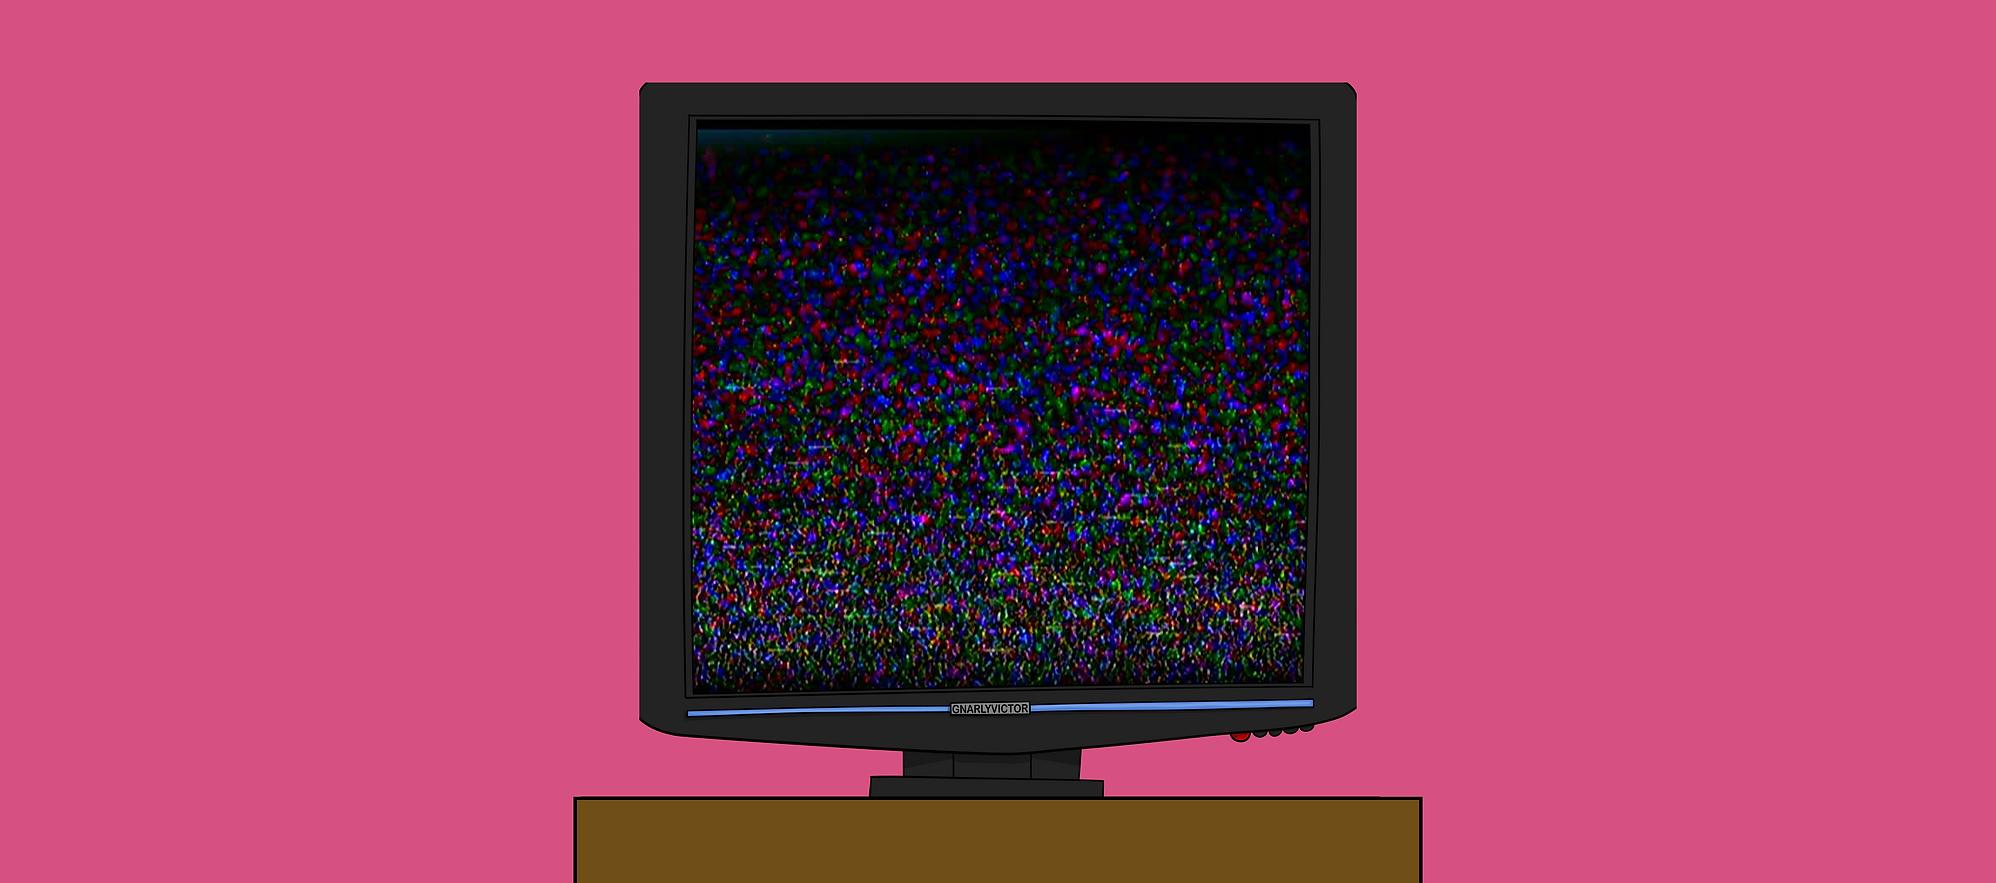 tv 2010.png